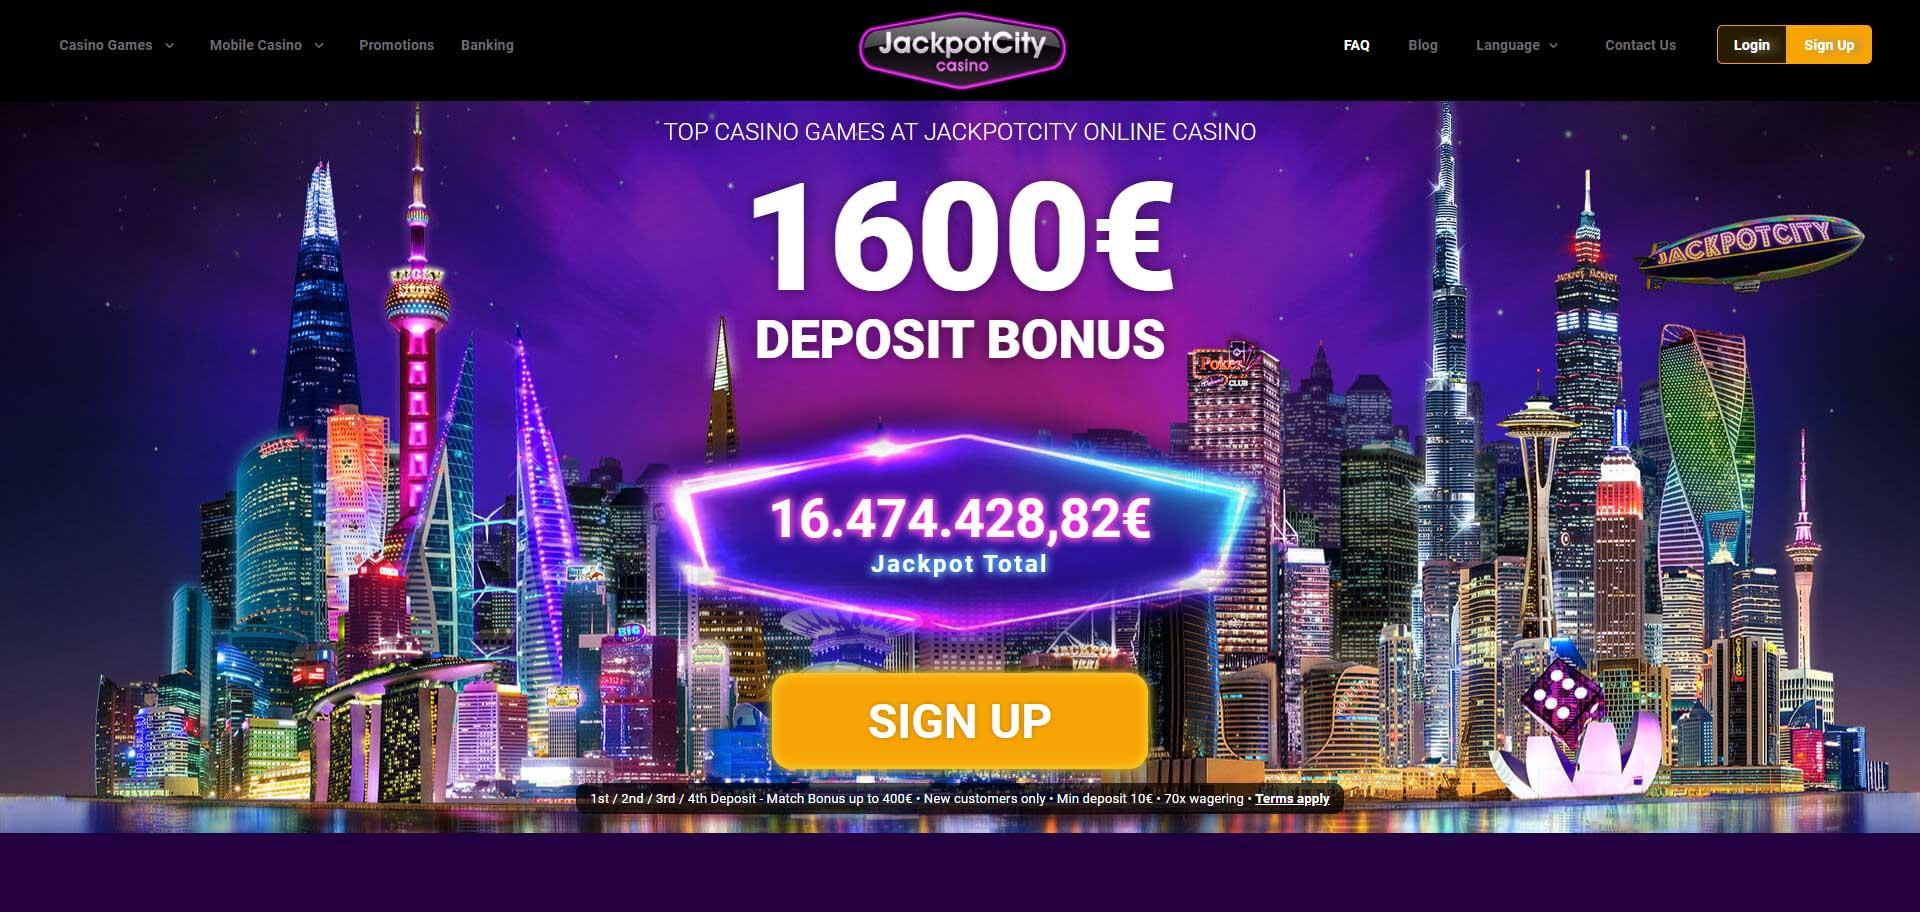 1600 deposit bonus - jackpot scity free spins